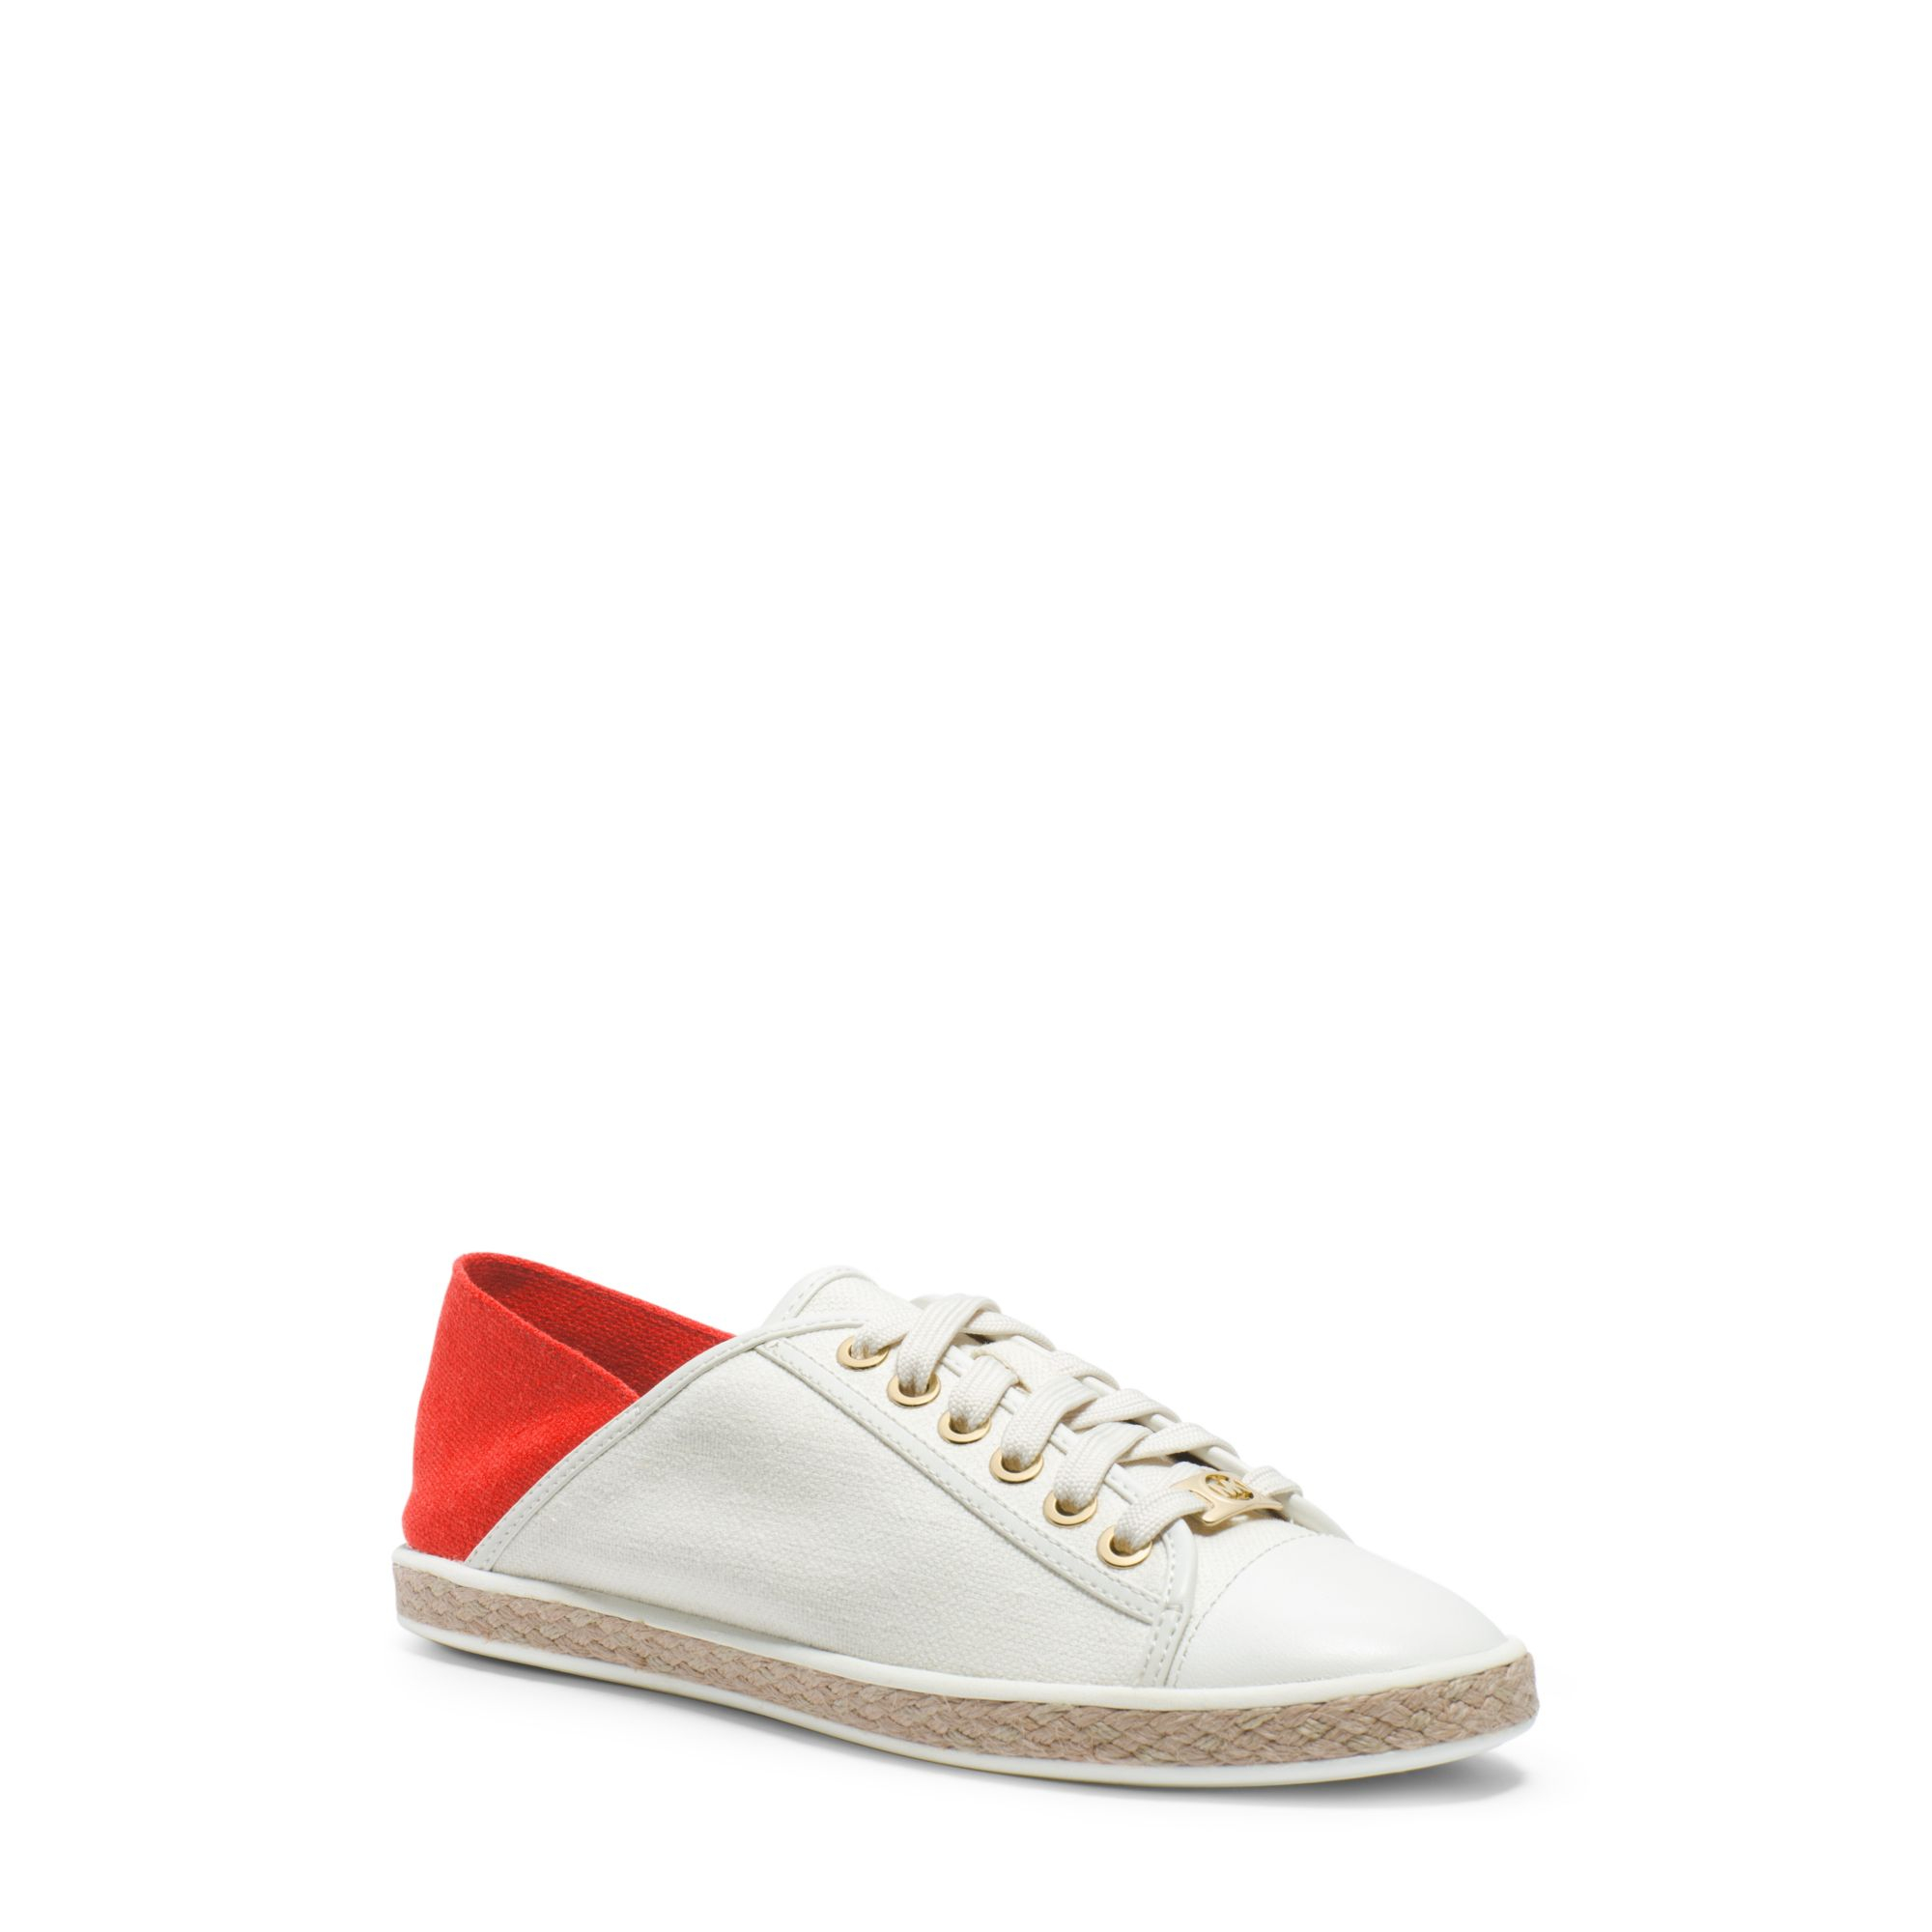 Lyst Michael Kors Kristy Color Block Canvas Sneaker In White